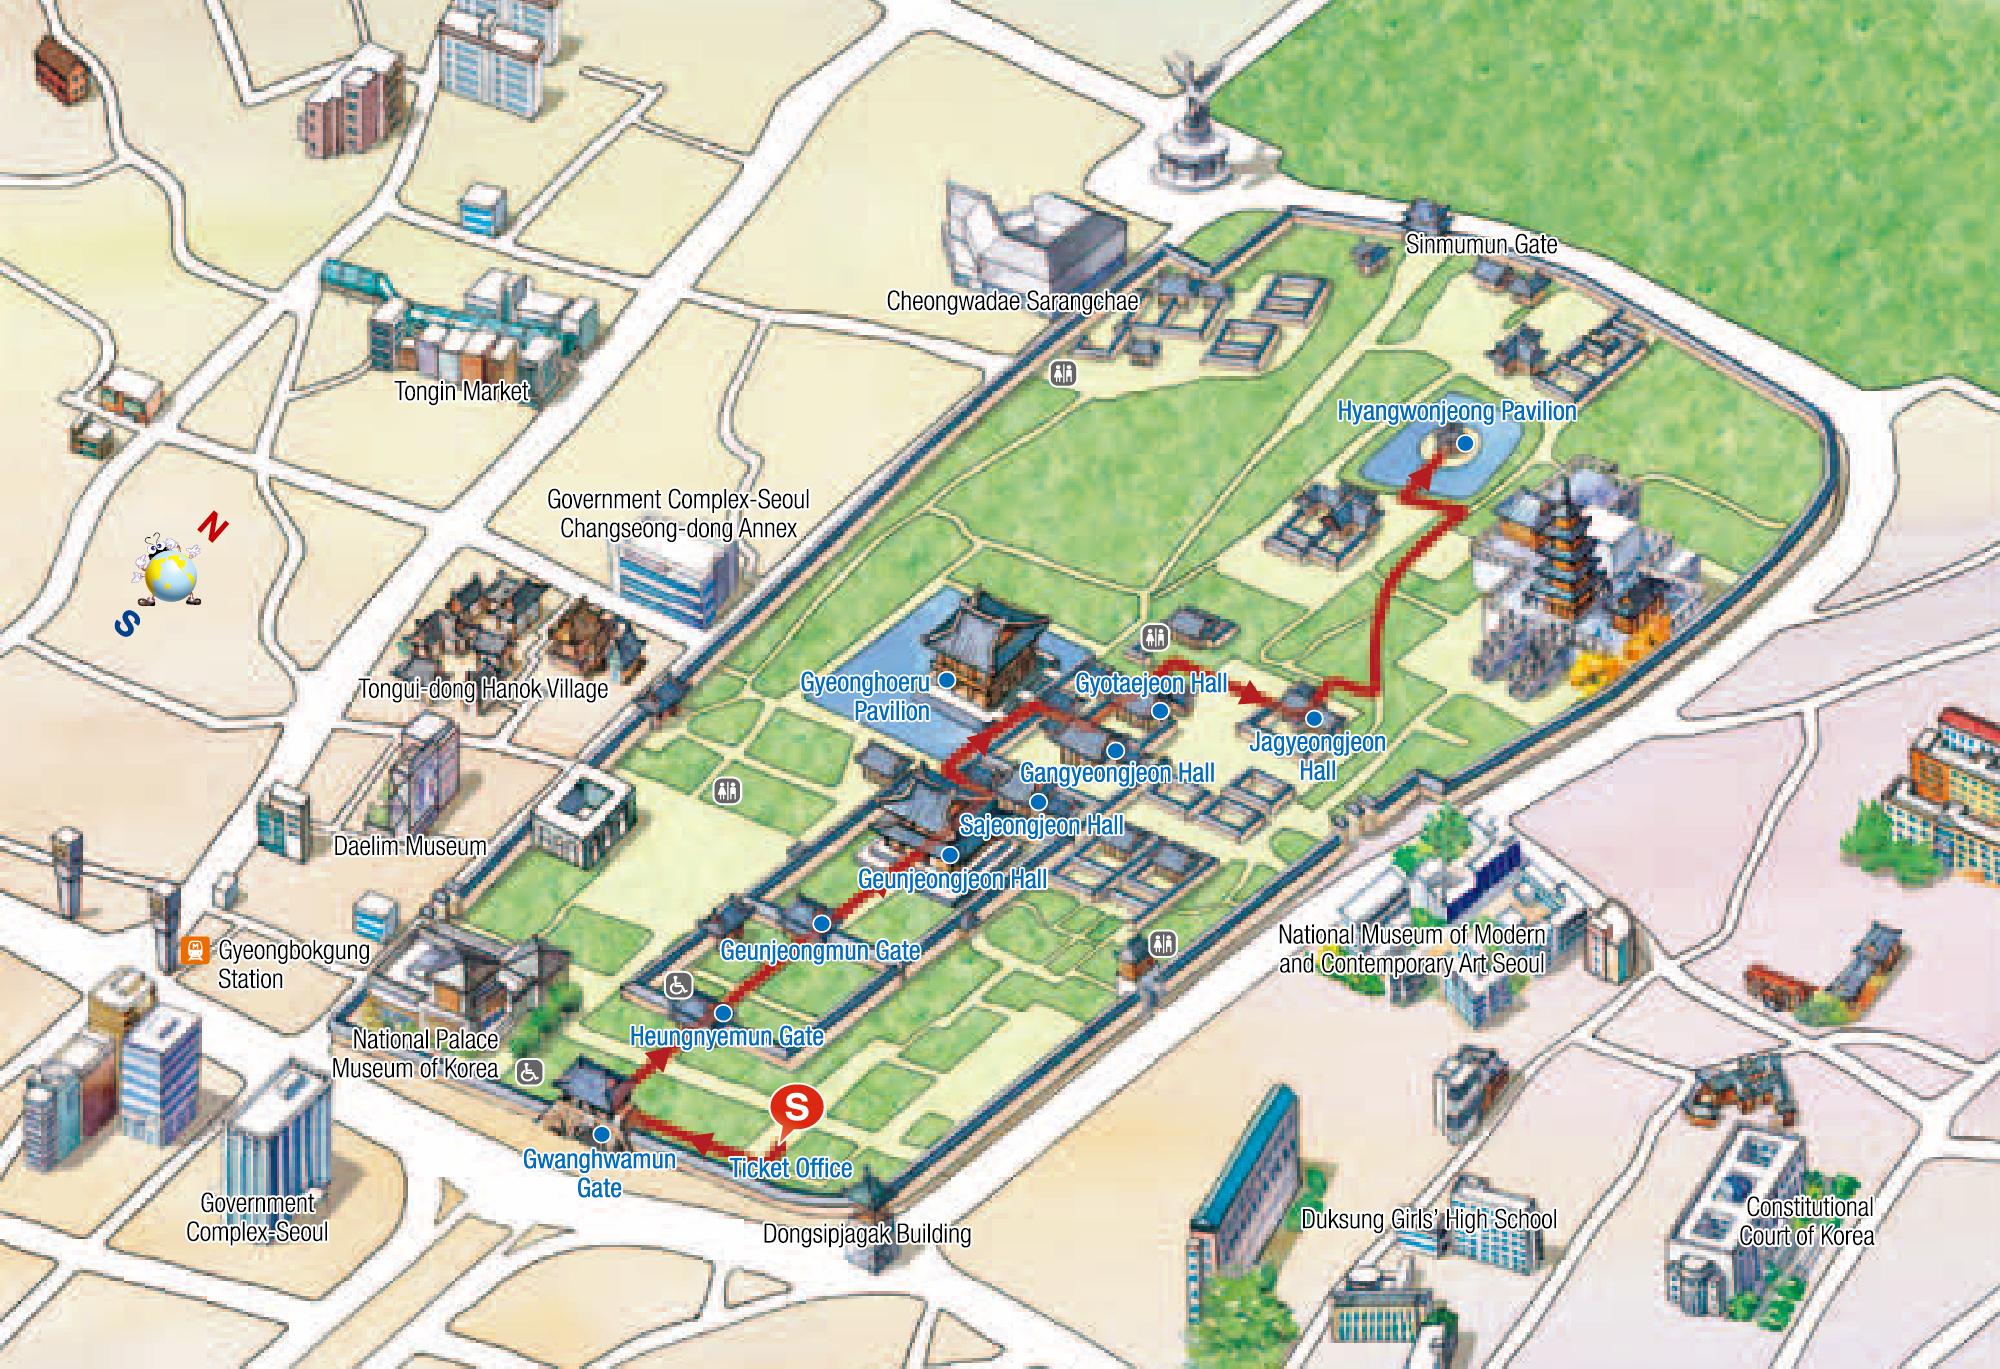 Route: Gwanghwamun (Main and South Gate) - Heungnyemun (Second Inner Gate) - Geunjeongmun (Third Inner Gate) - Geunjeongjeon (Imperial Throne Hall) - Sajeongjeon (Executive Office) - Gyeonghoeru (Royal Banquet Pavilion) - Gangnyeongjeon (King's Quarters) - Gyotaejeon (Queen's Quarters) - Jagyeongjeon (Late Queen's Quarters) - Hyangwonjeong (Hyangwonjeong Pavilion)